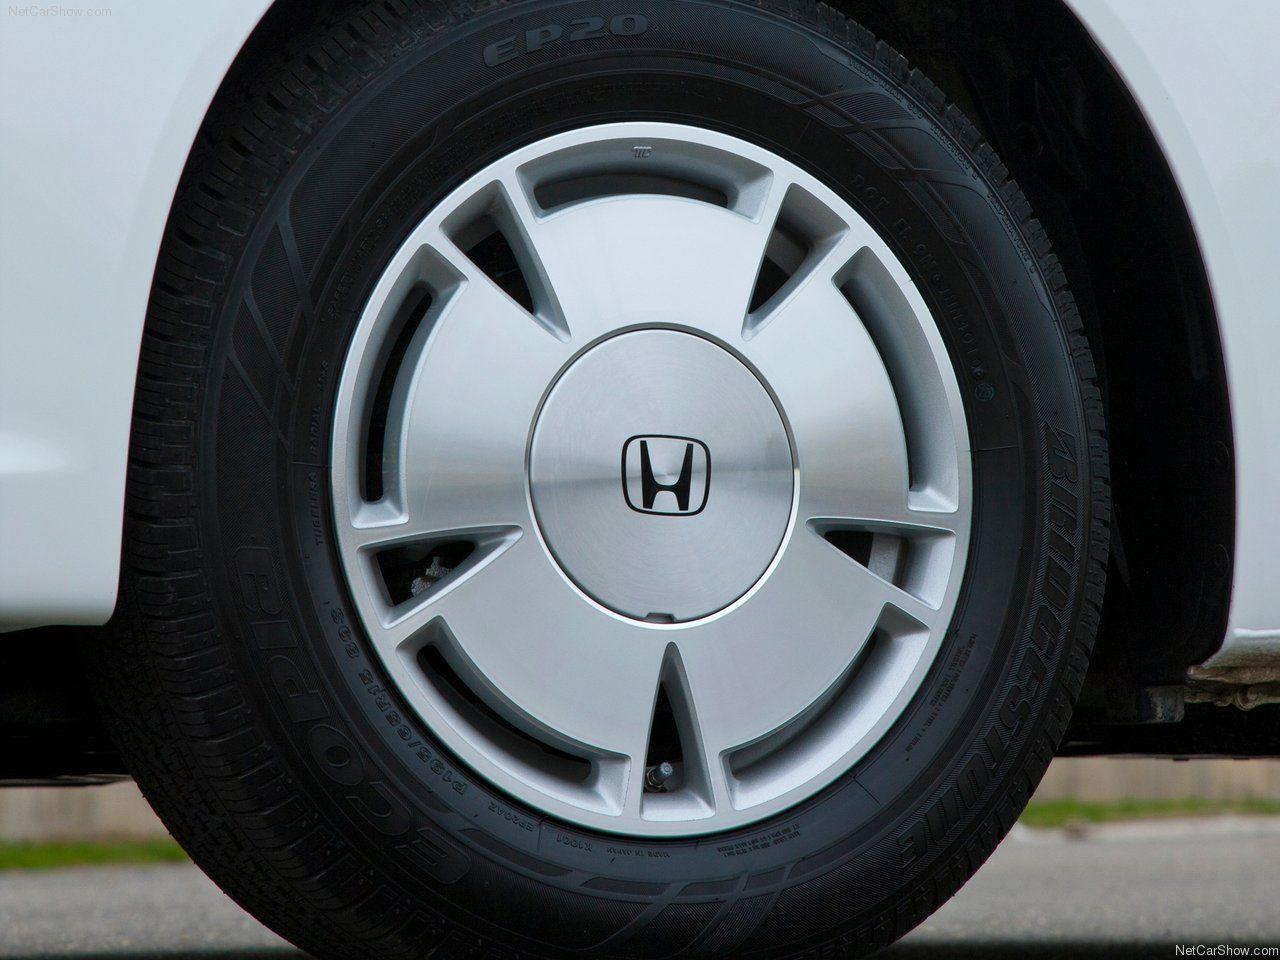 Honda Civic Hf Wheels Honda Civic Honda Honda Wheels